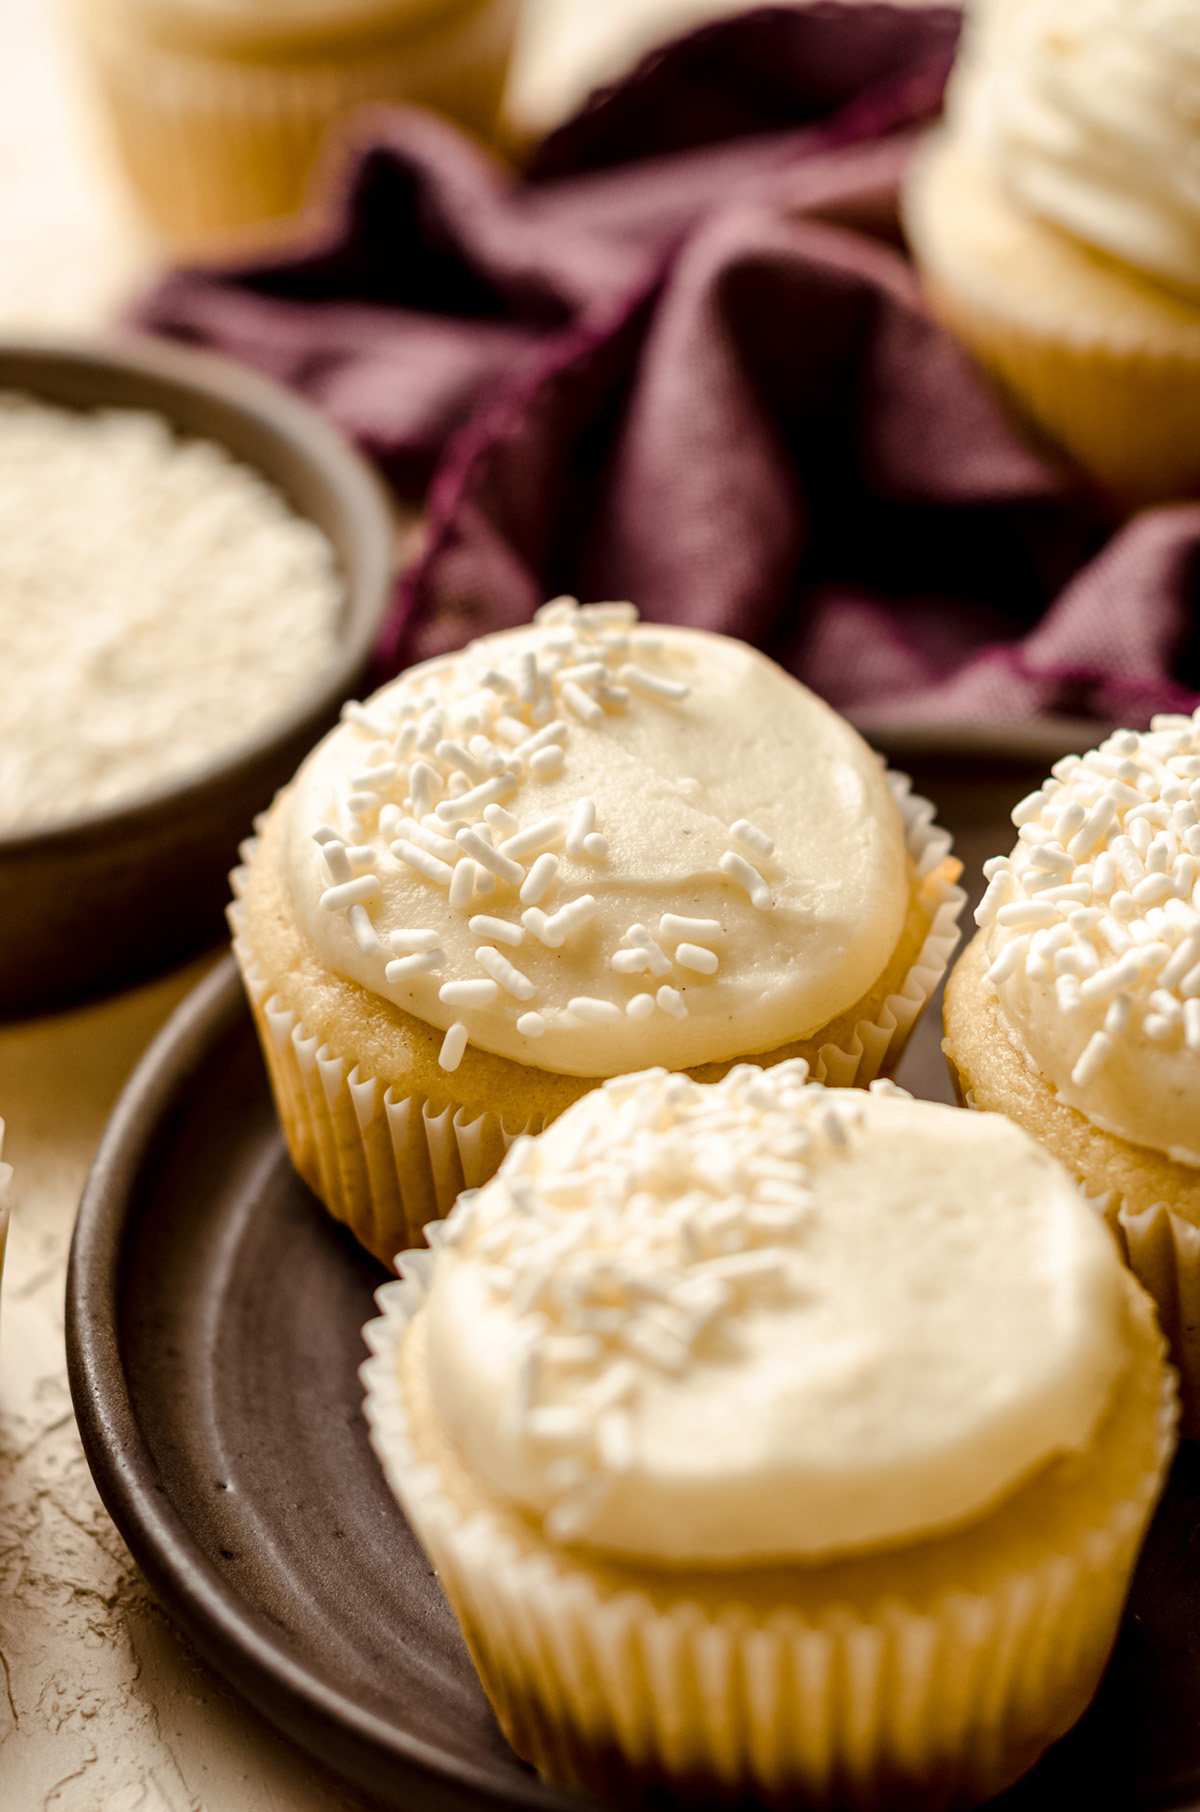 vanilla bean cupcakes on a plate